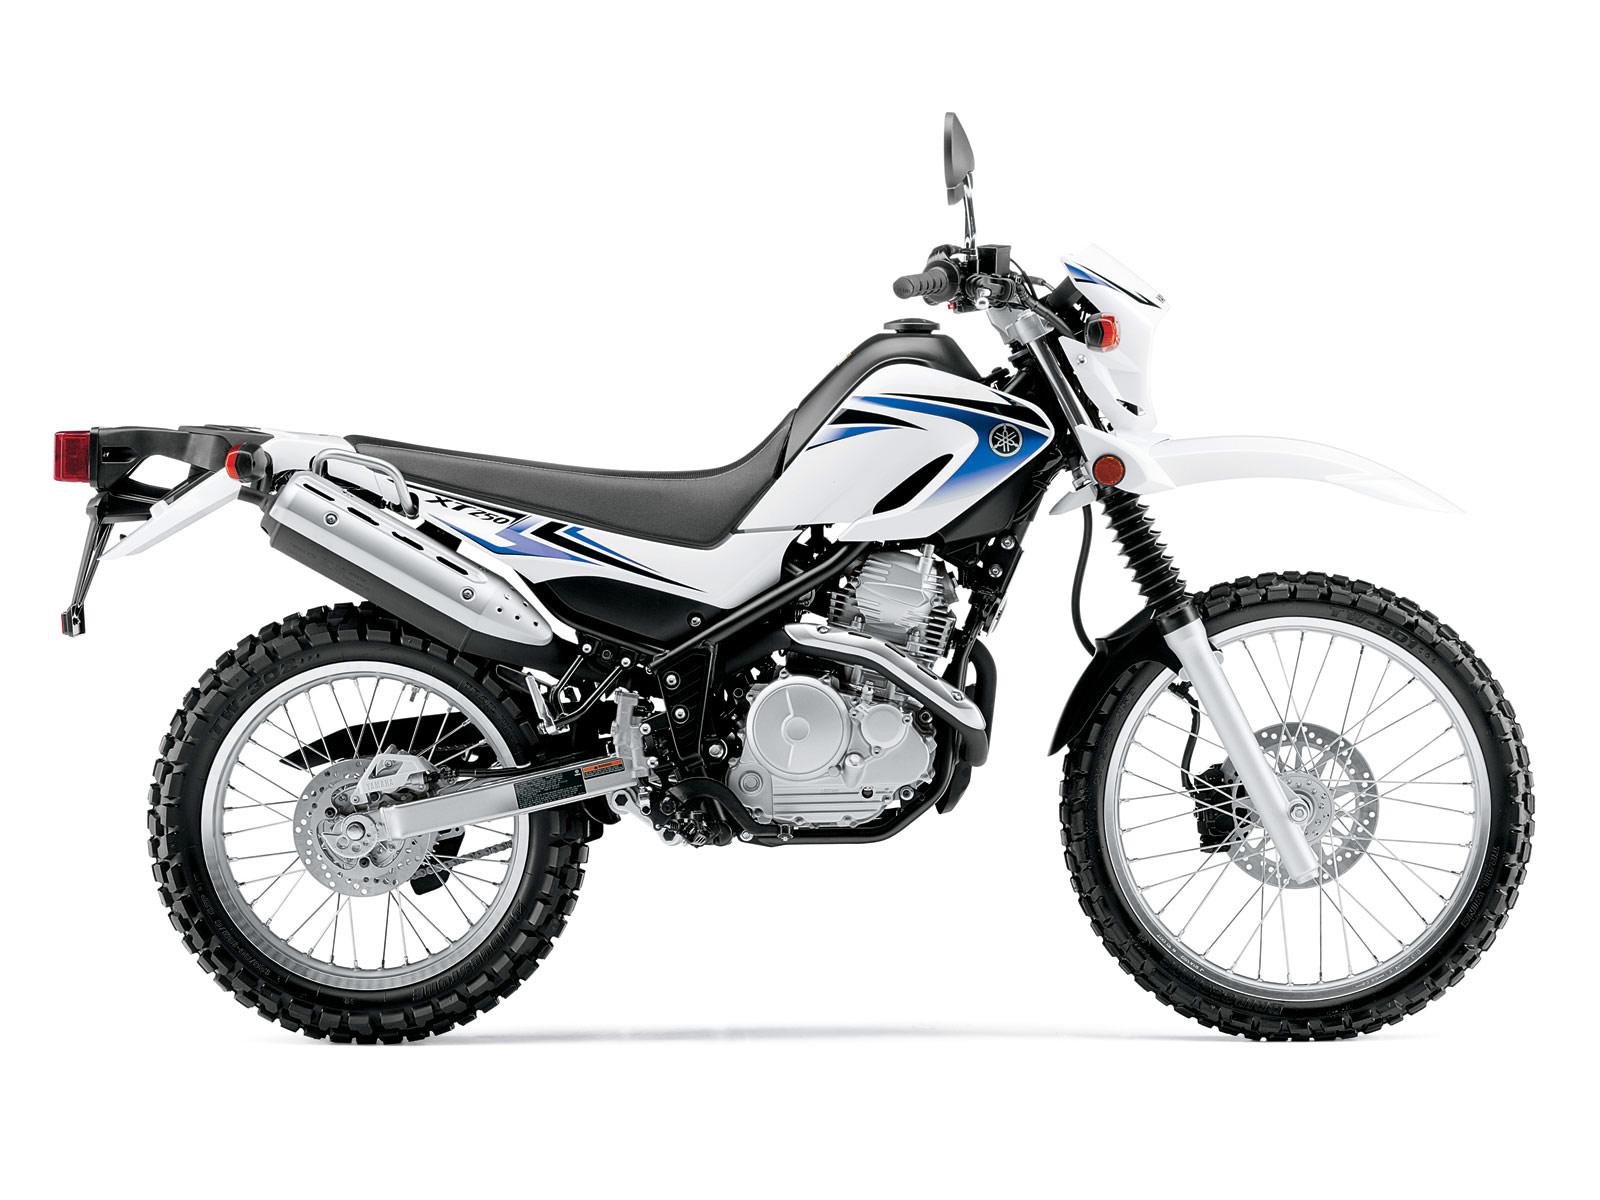 Yamaha Xt250 Motorcycle Insurance Information